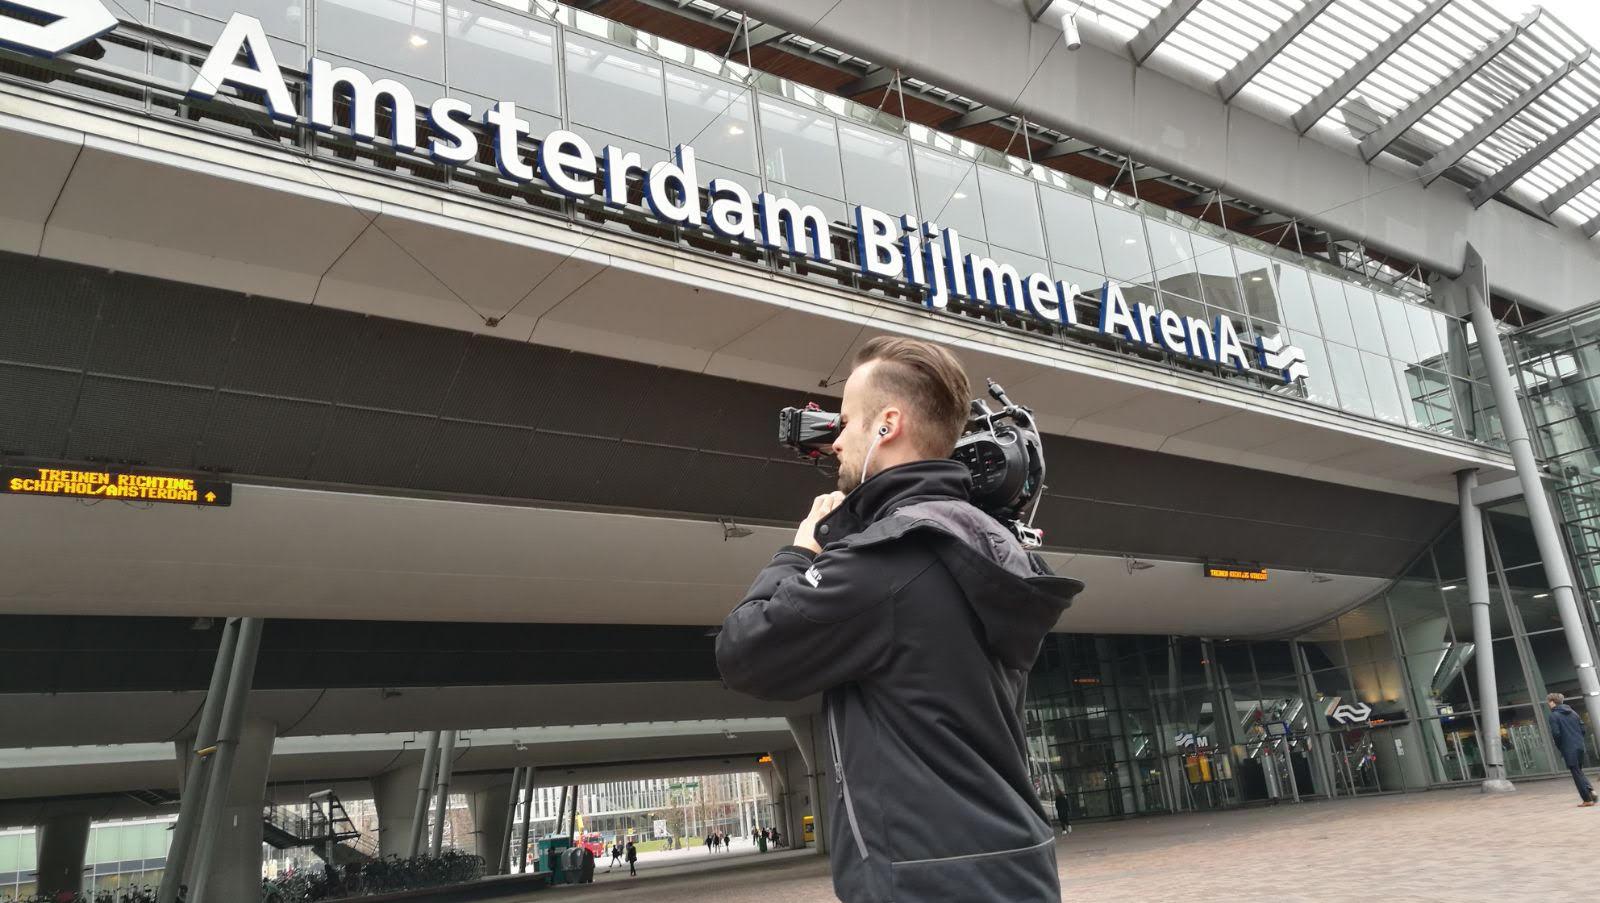 Opnames op station Amsterdam Bijlmer ArenA